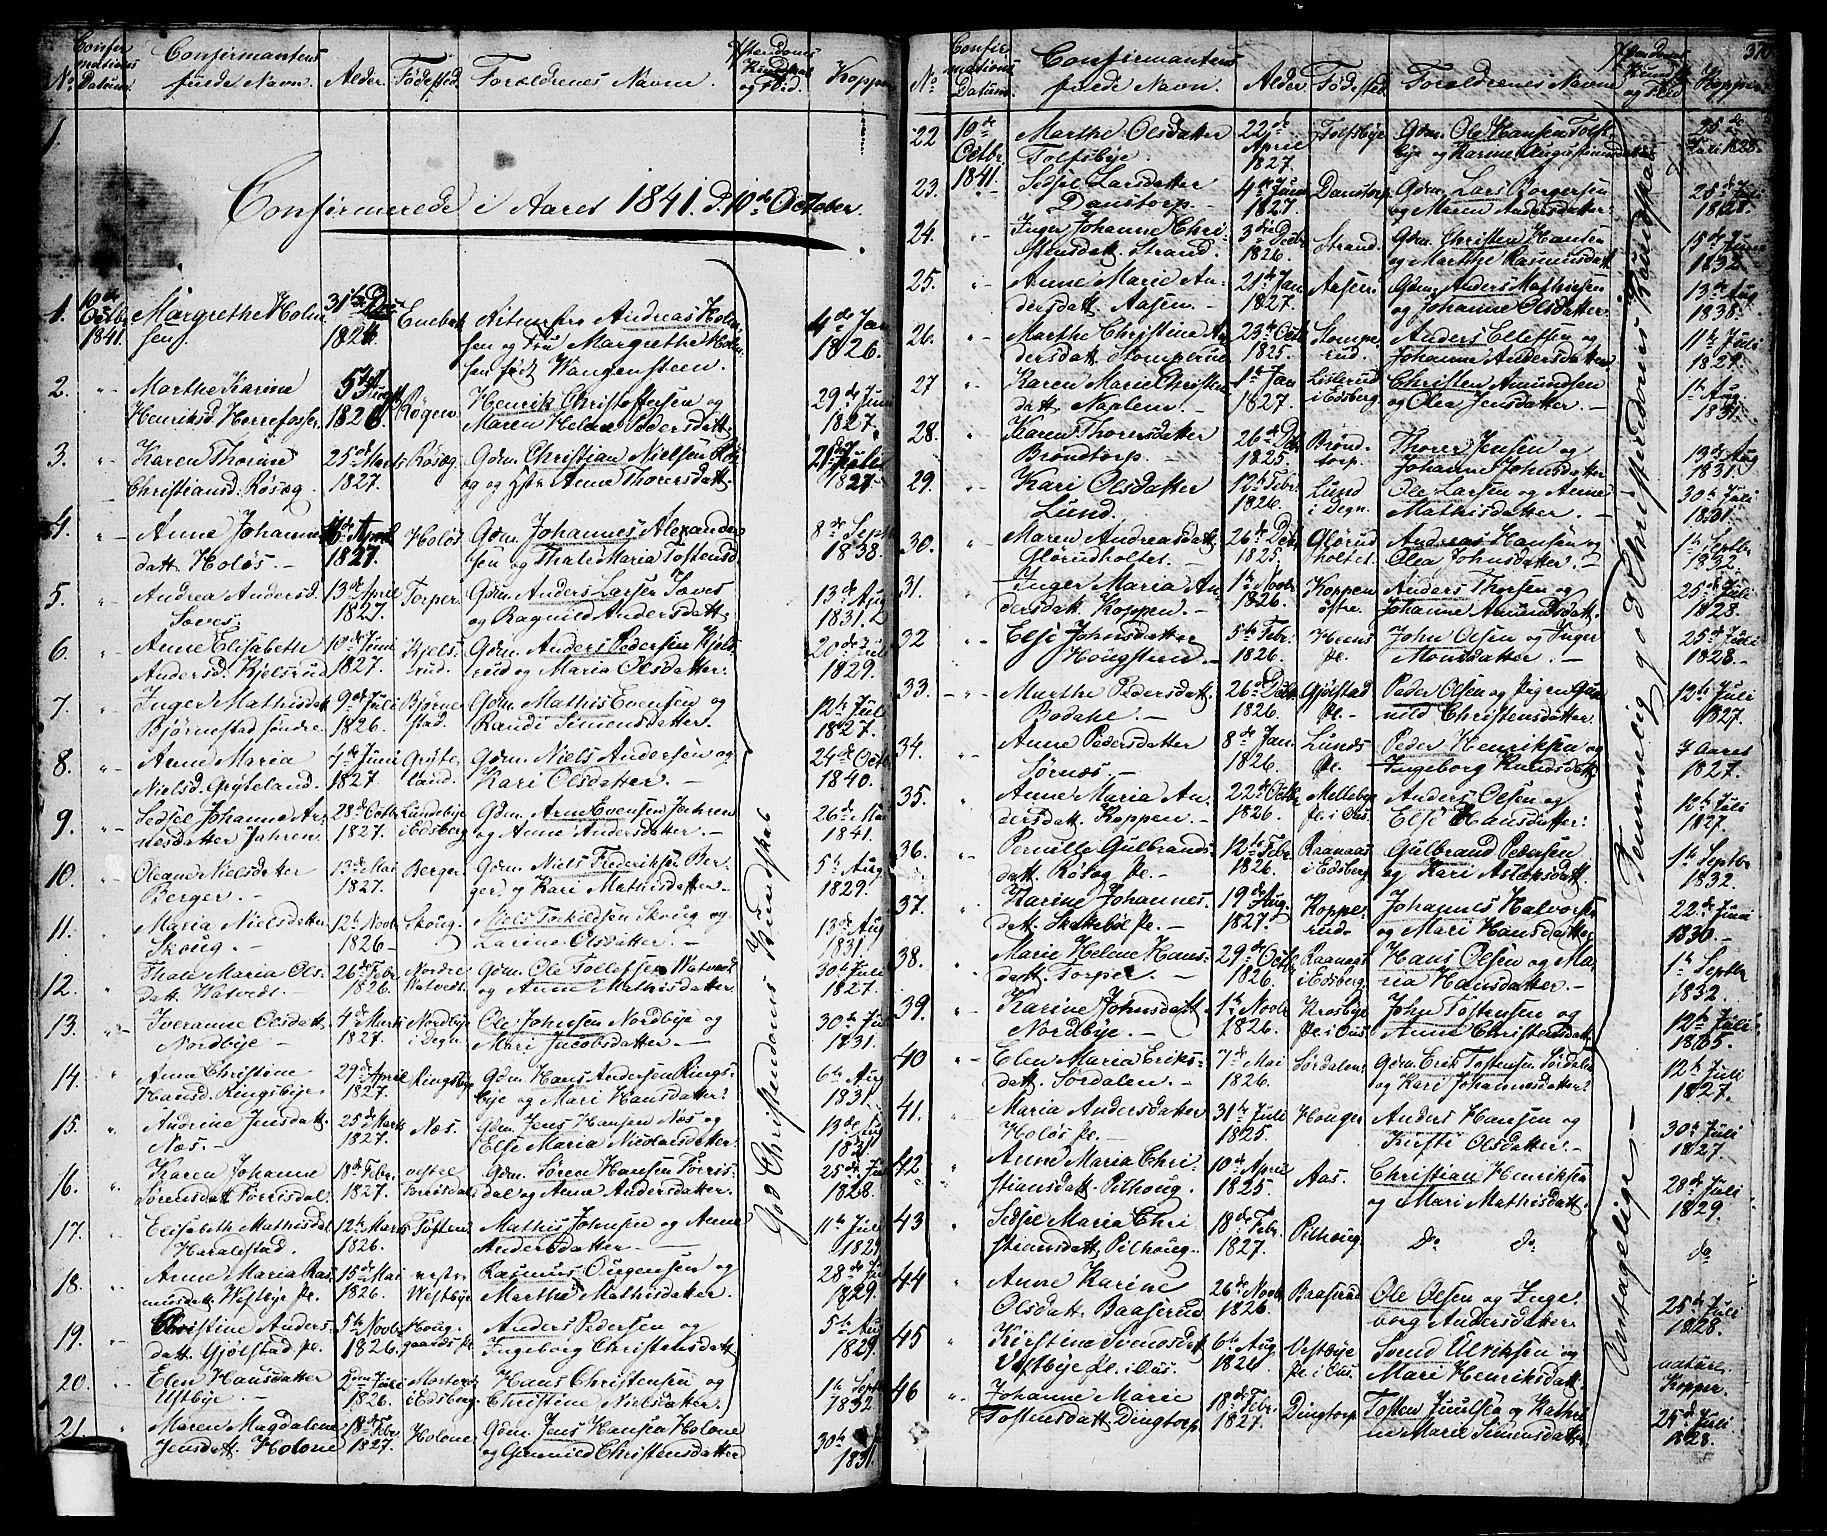 SAO, Rakkestad prestekontor Kirkebøker, F/Fa/L0007: Ministerialbok nr. I 7, 1825-1841, s. 370